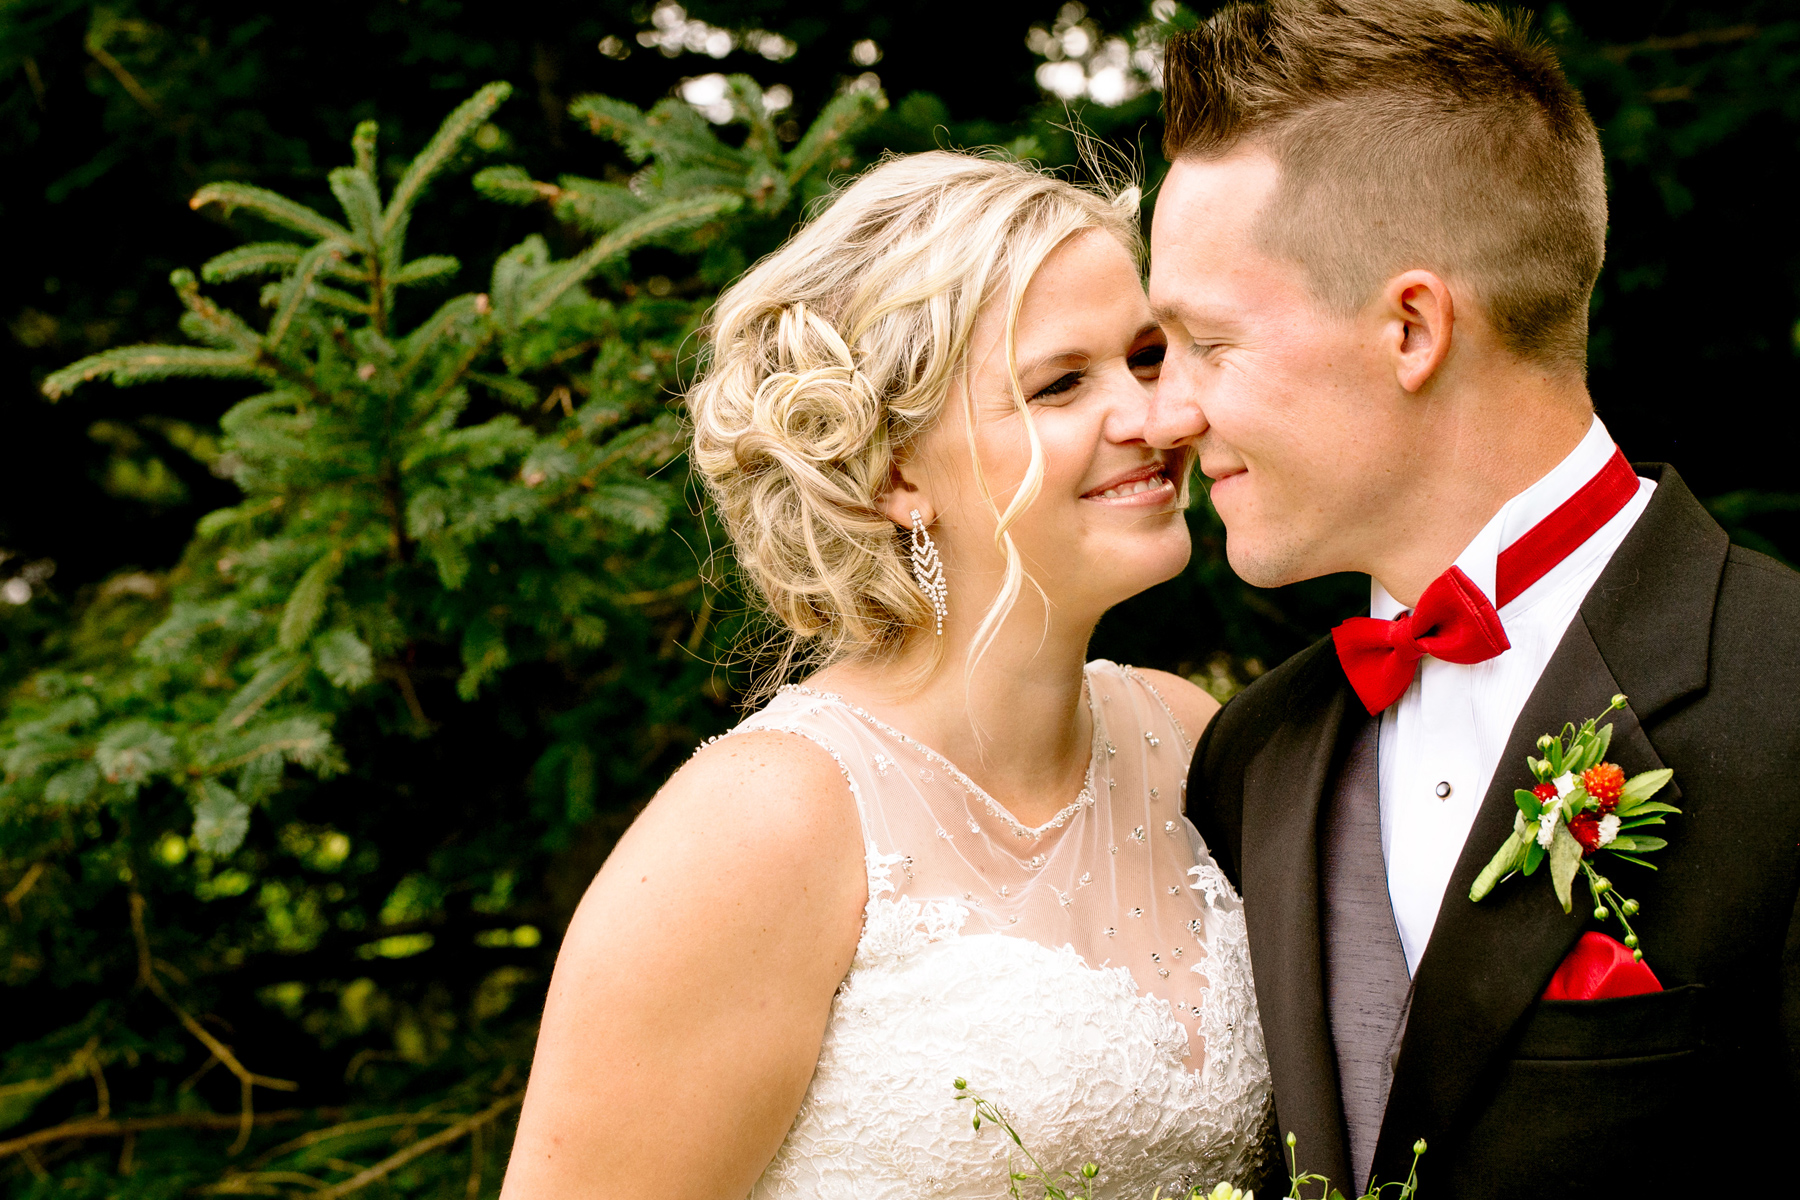 001-awesome-pei-wedding-photography-kandisebrown-jg2016